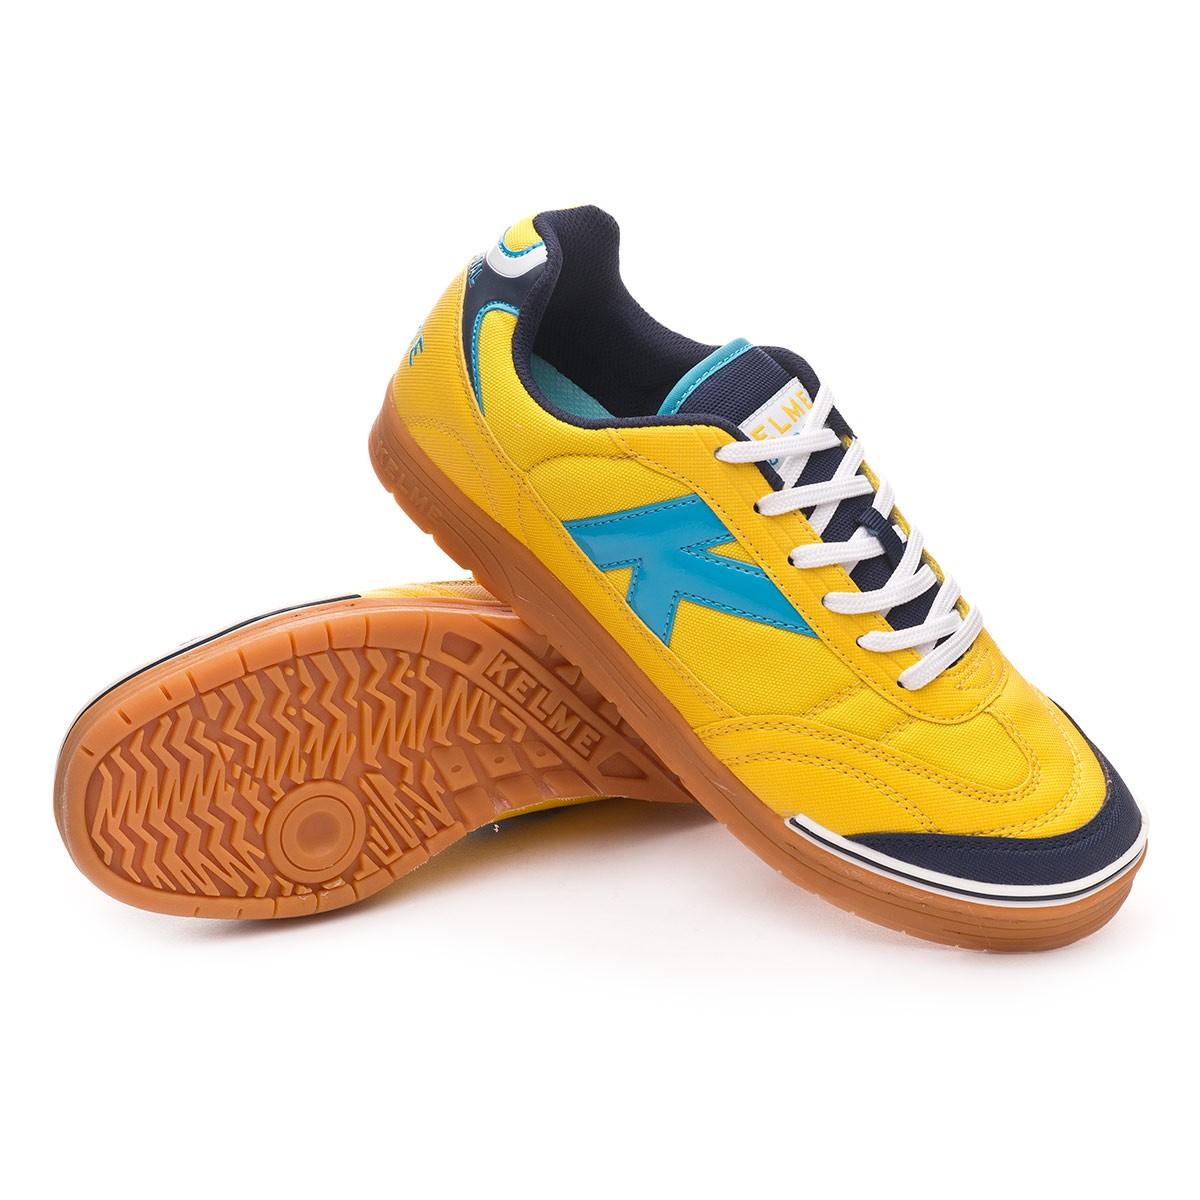 de42d37f55d Futsal Boot Kelme Trueno Sala Yellow-Turquoise - Football store Fútbol  Emotion